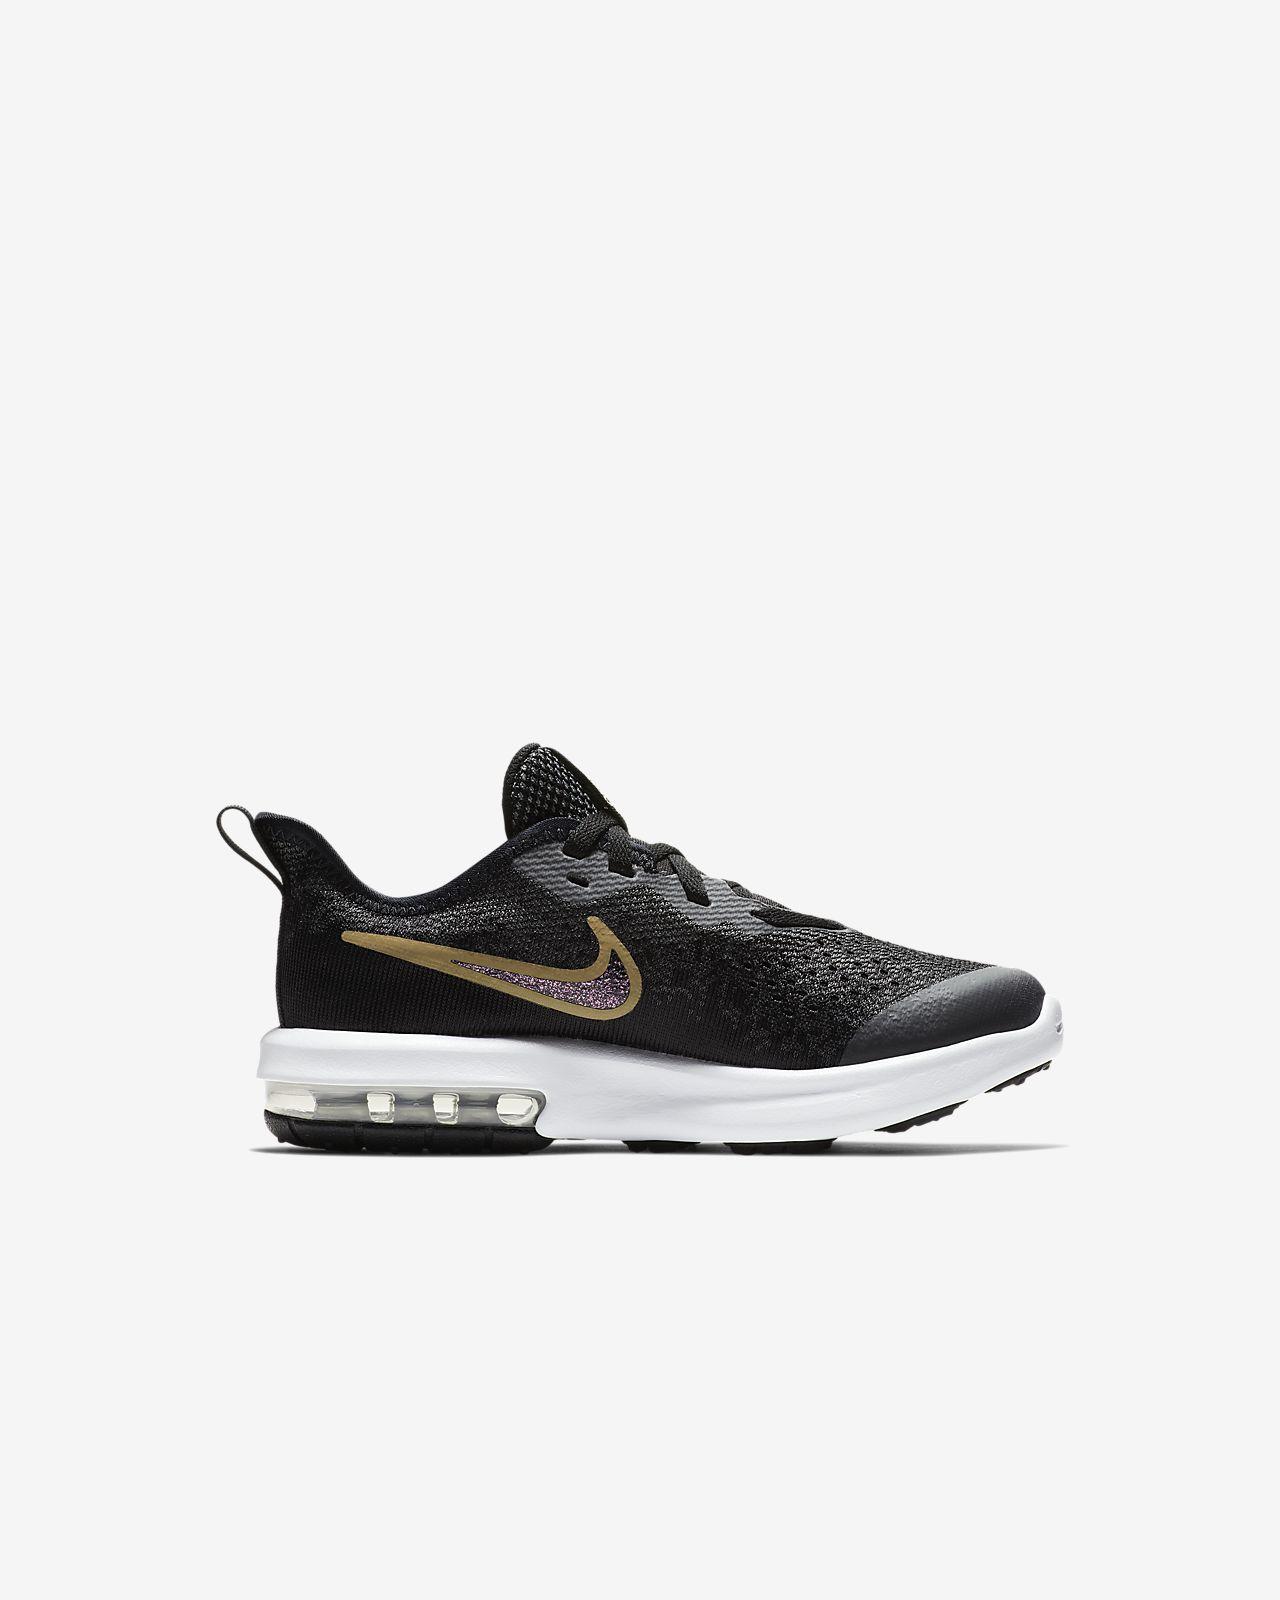 info for 86da4 96482 Nike Air Max Sequent 4 Shine